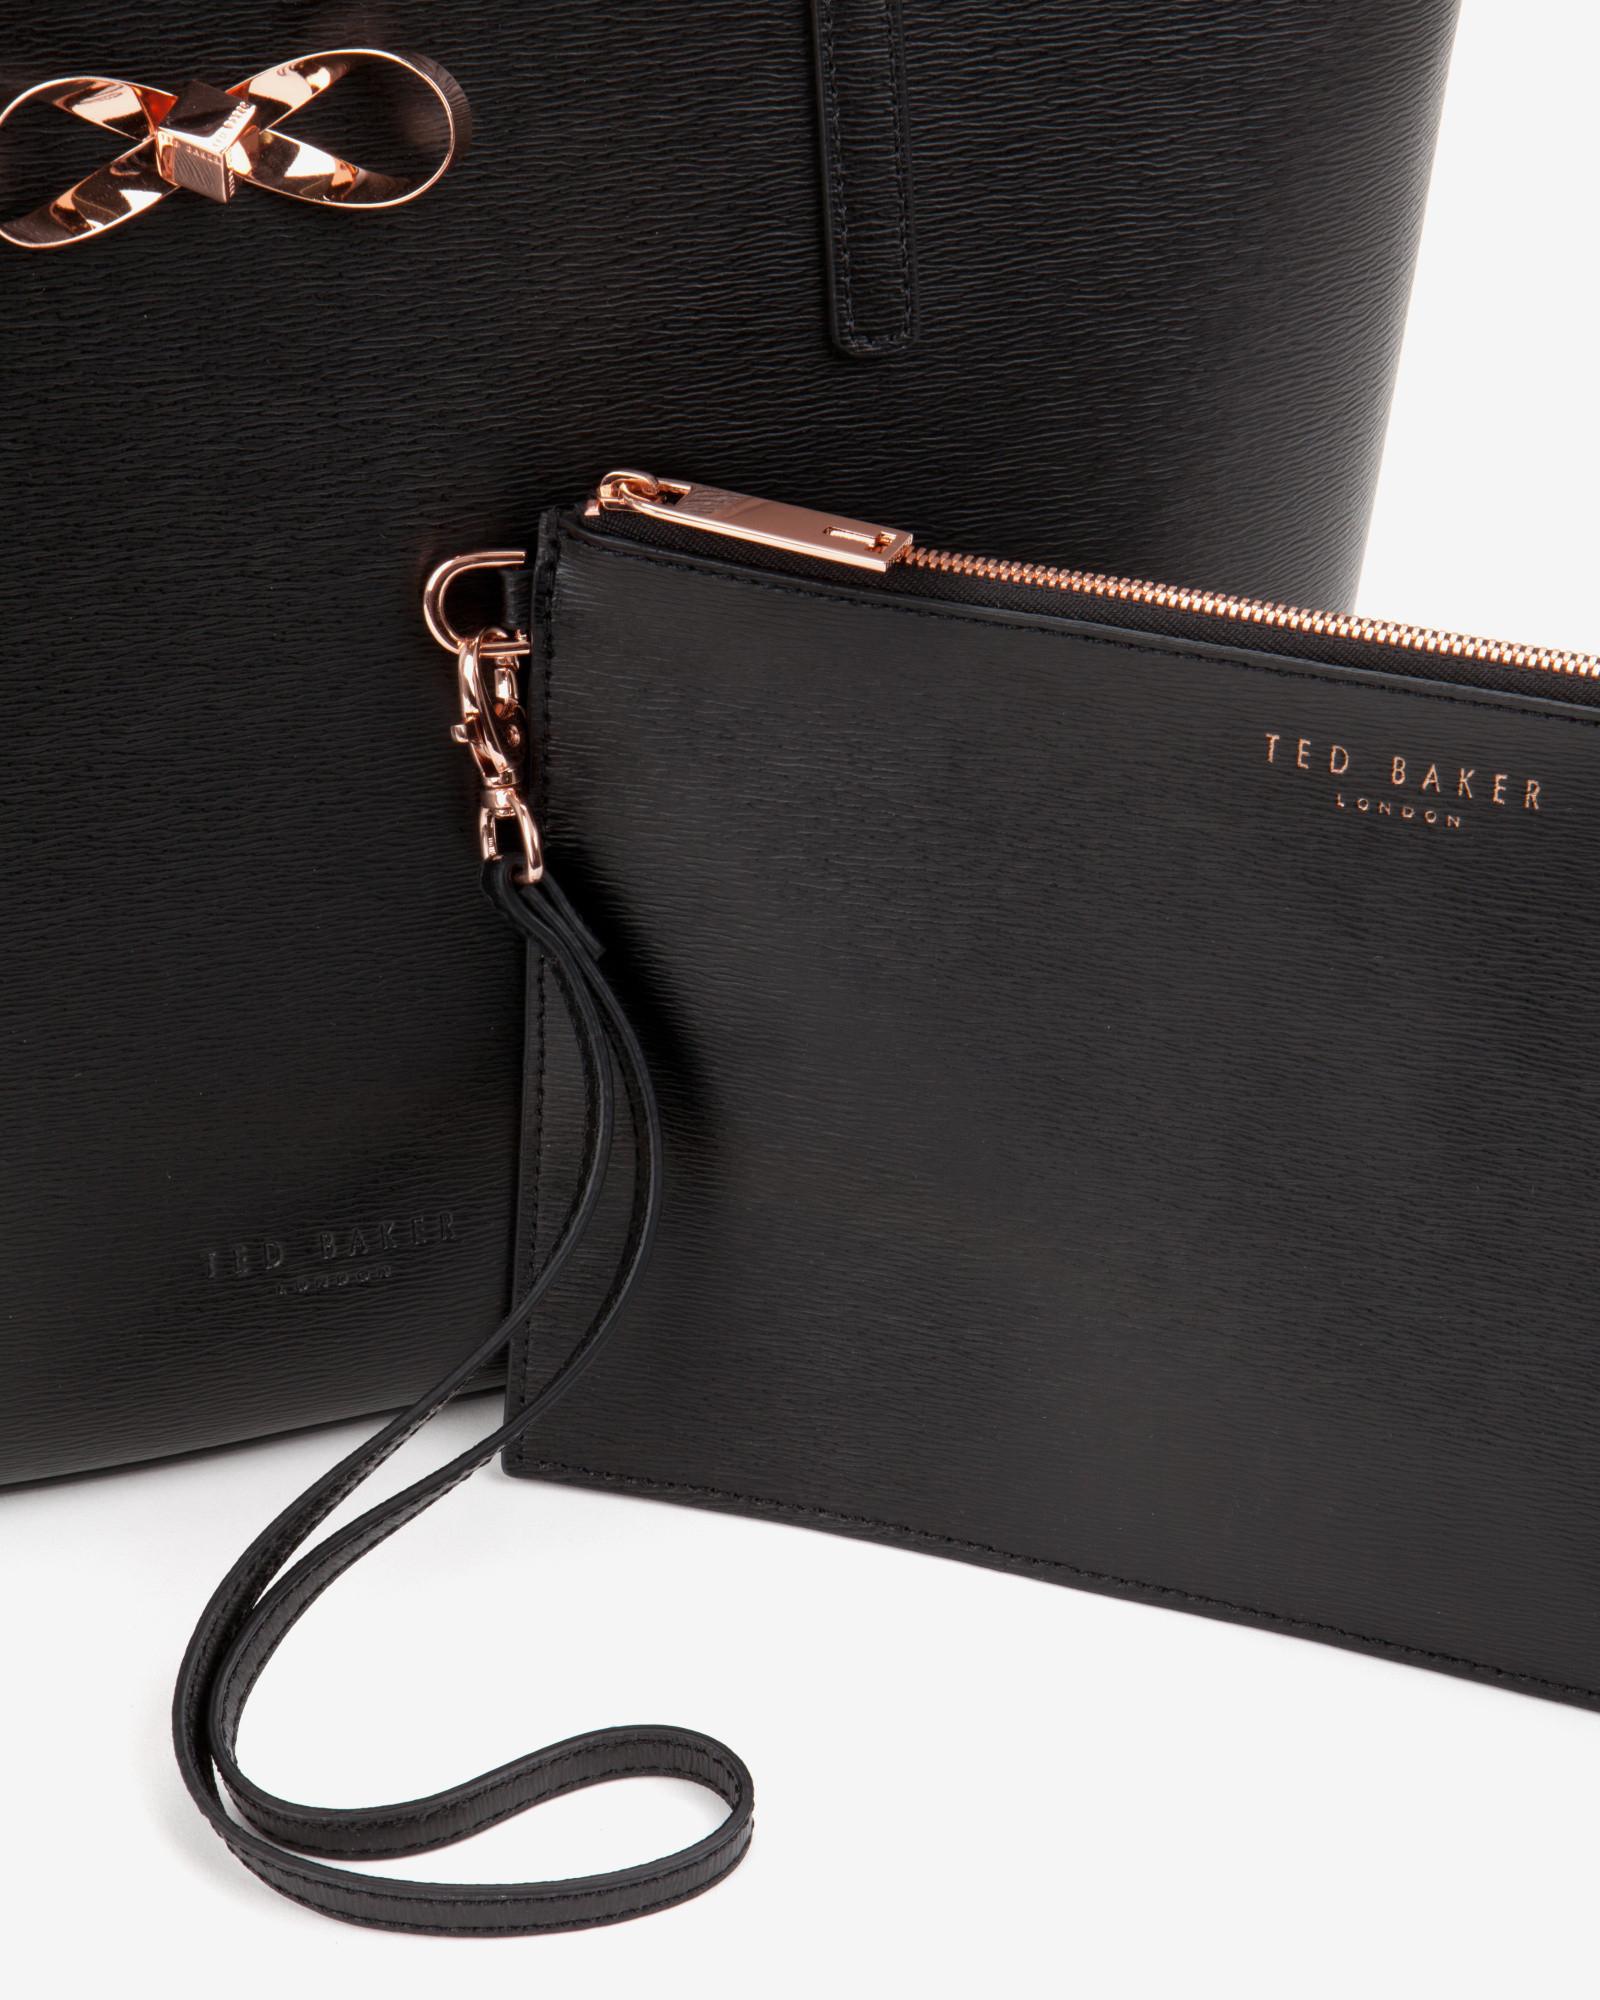 Ted Baker Handbag Rose Gold Hardware